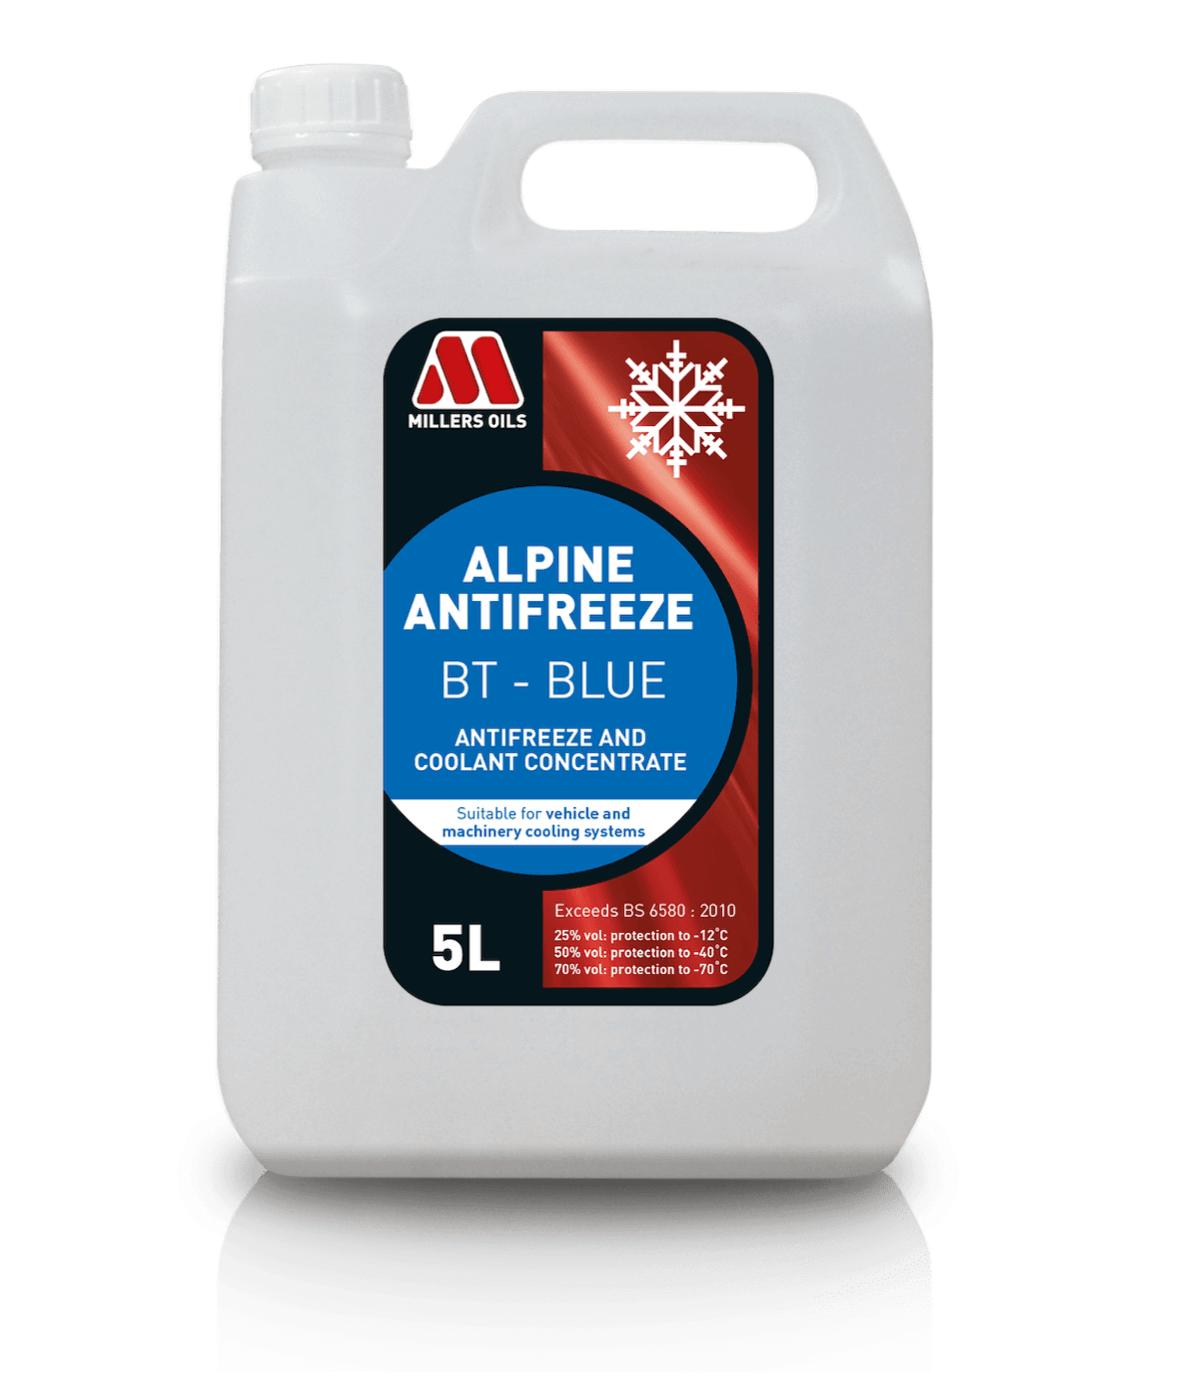 5L Antifreeze BT BLUE